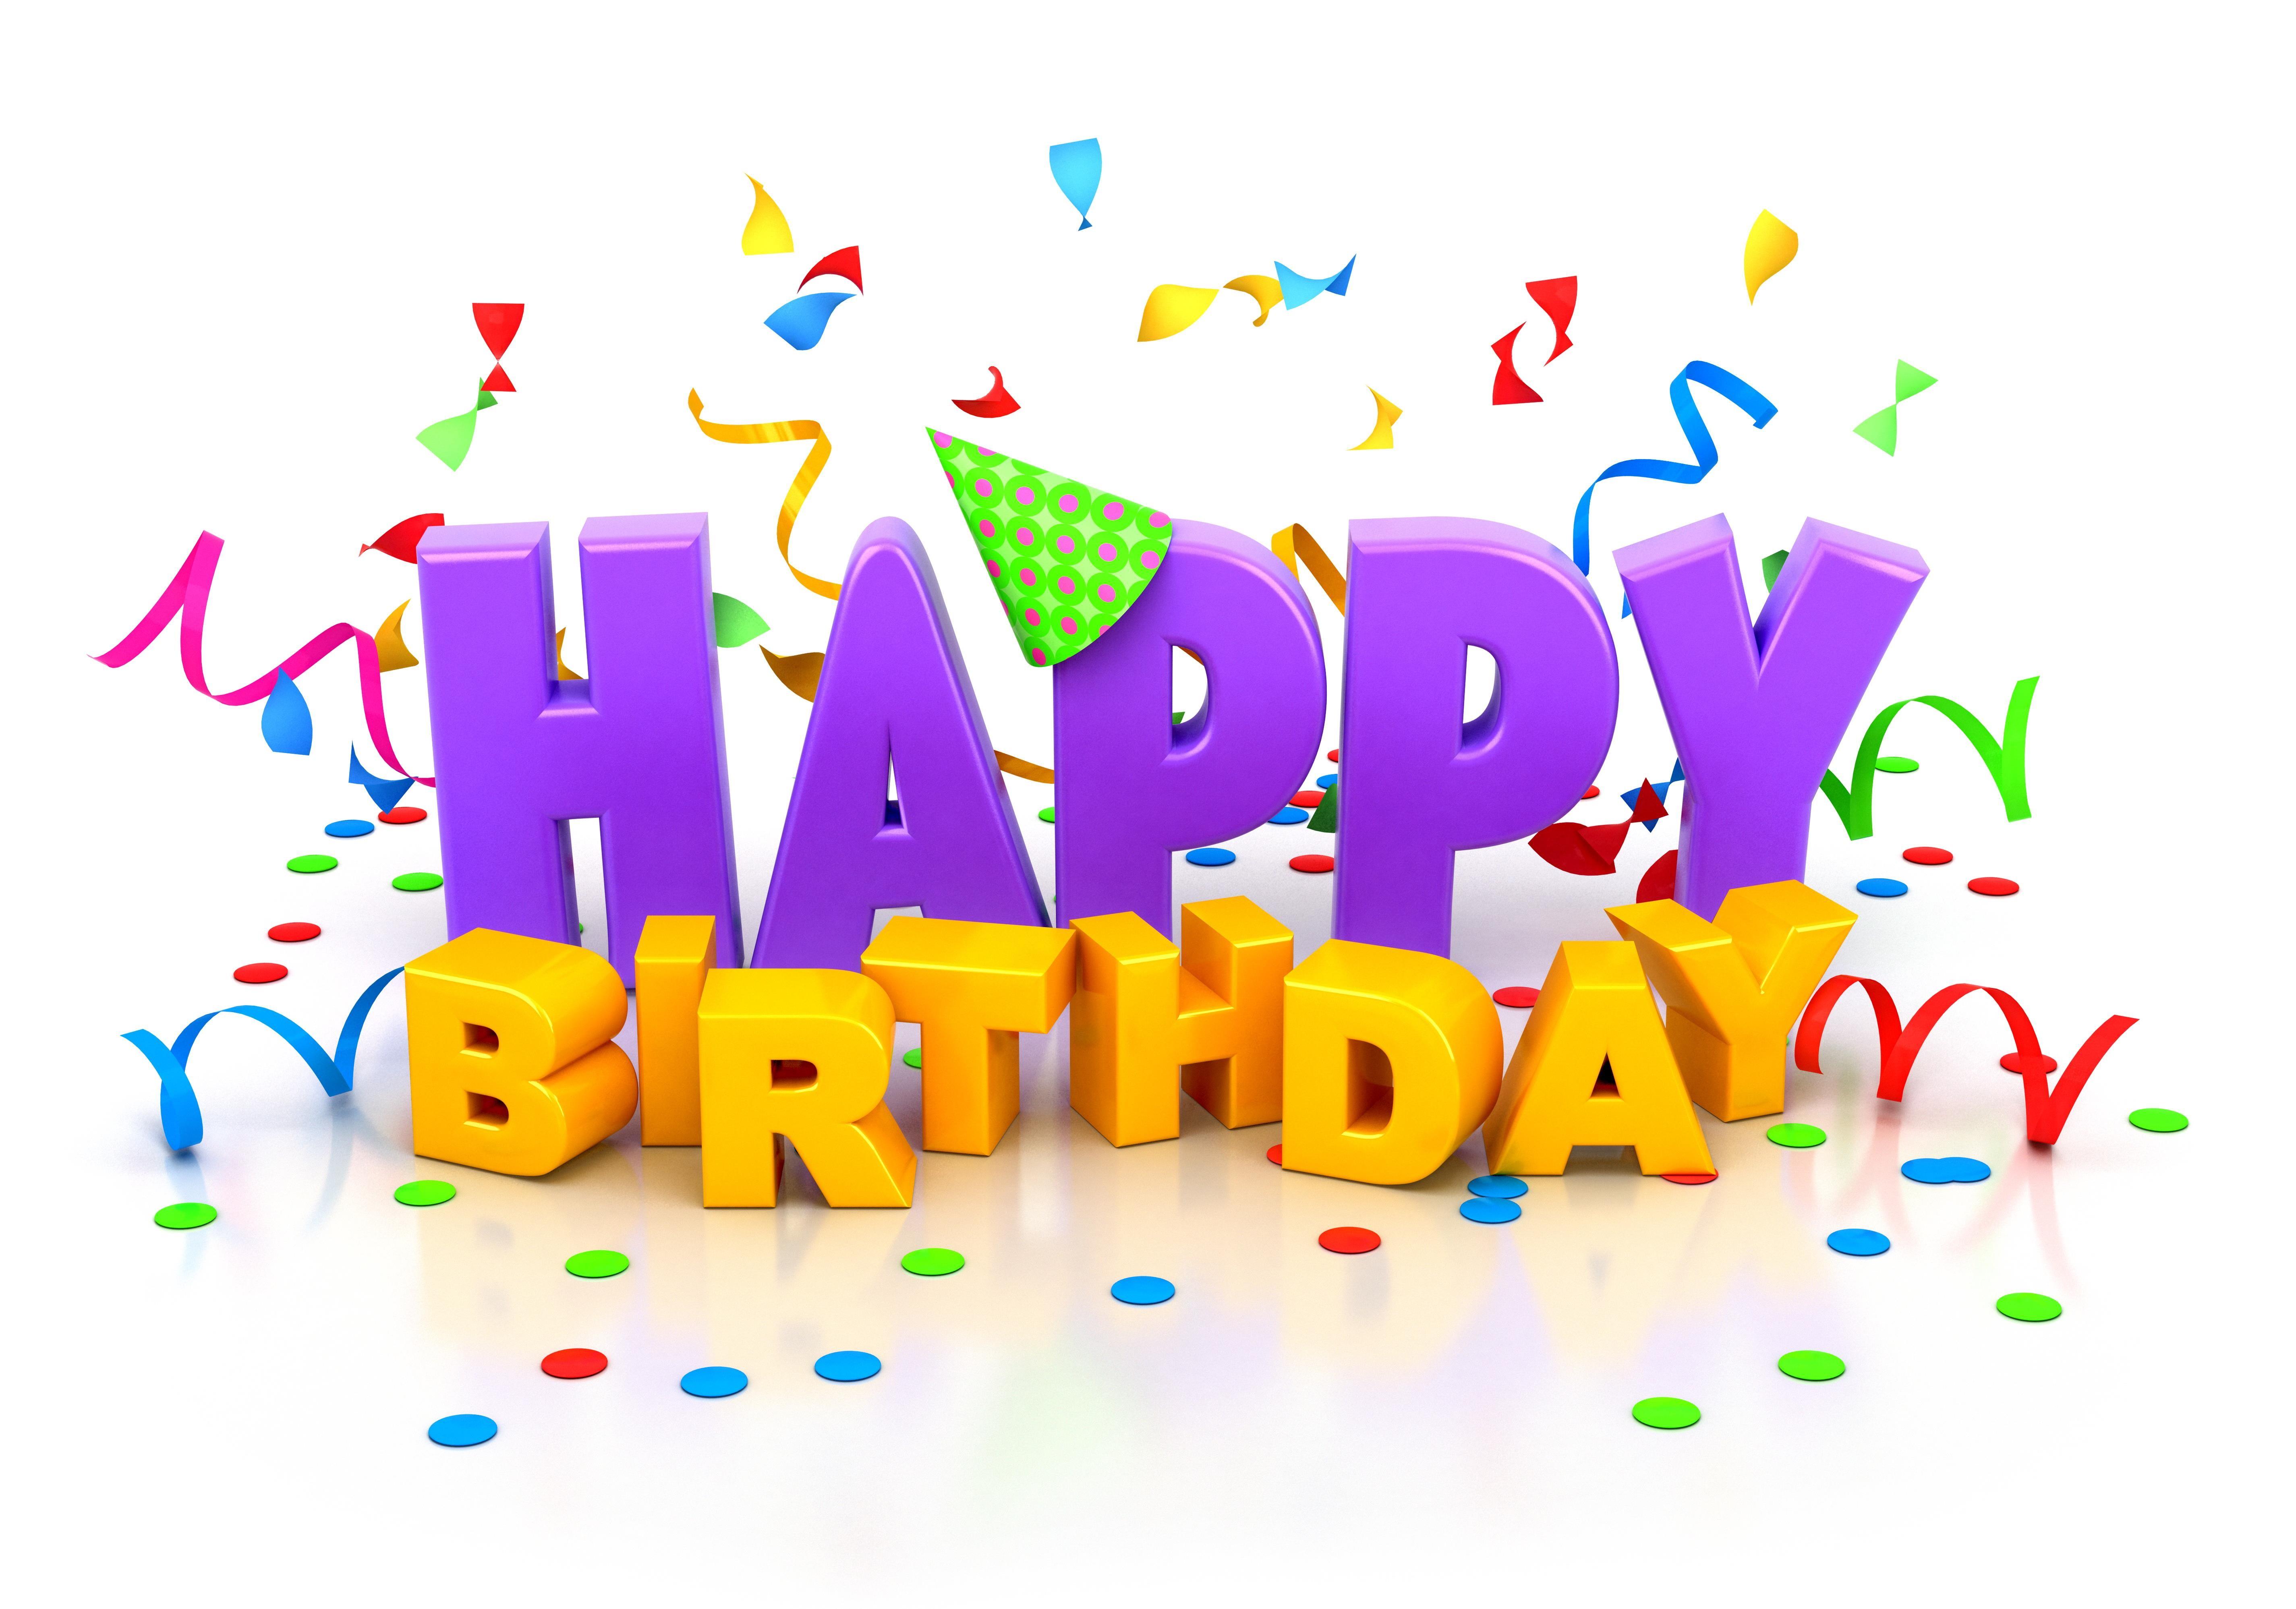 Happ Birthday